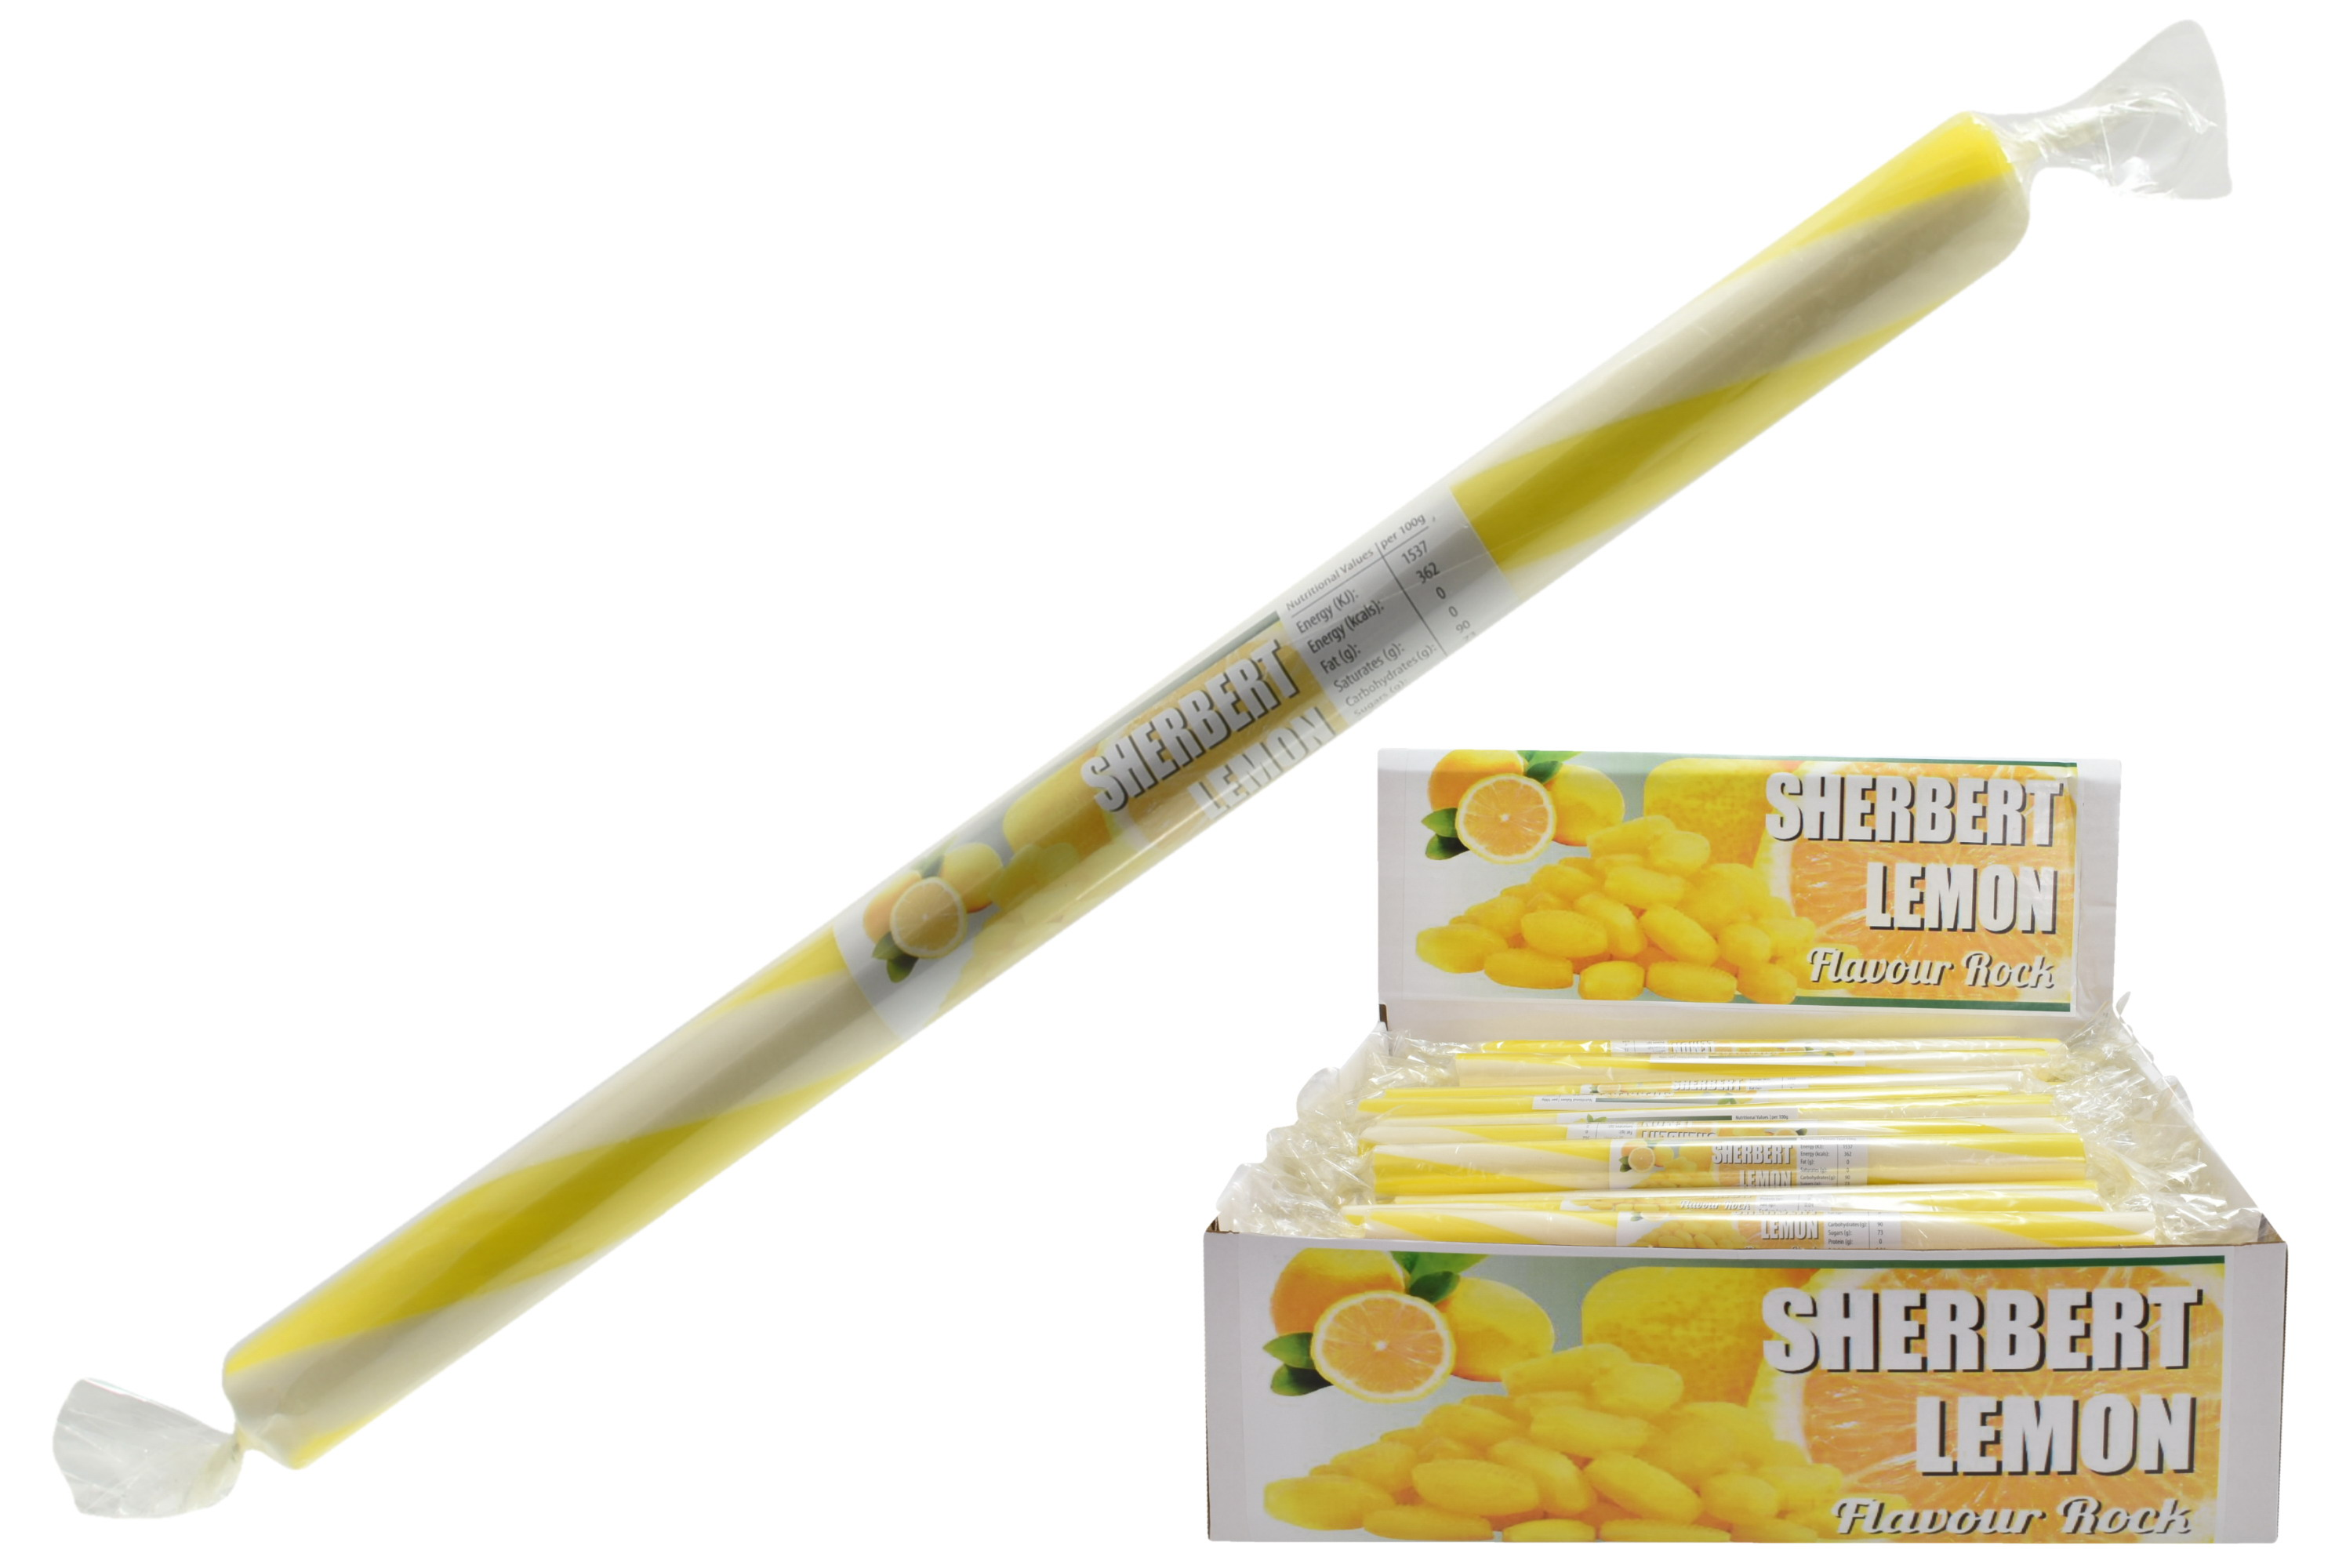 Lemon Sherbet - Flavoured Rock Sticks